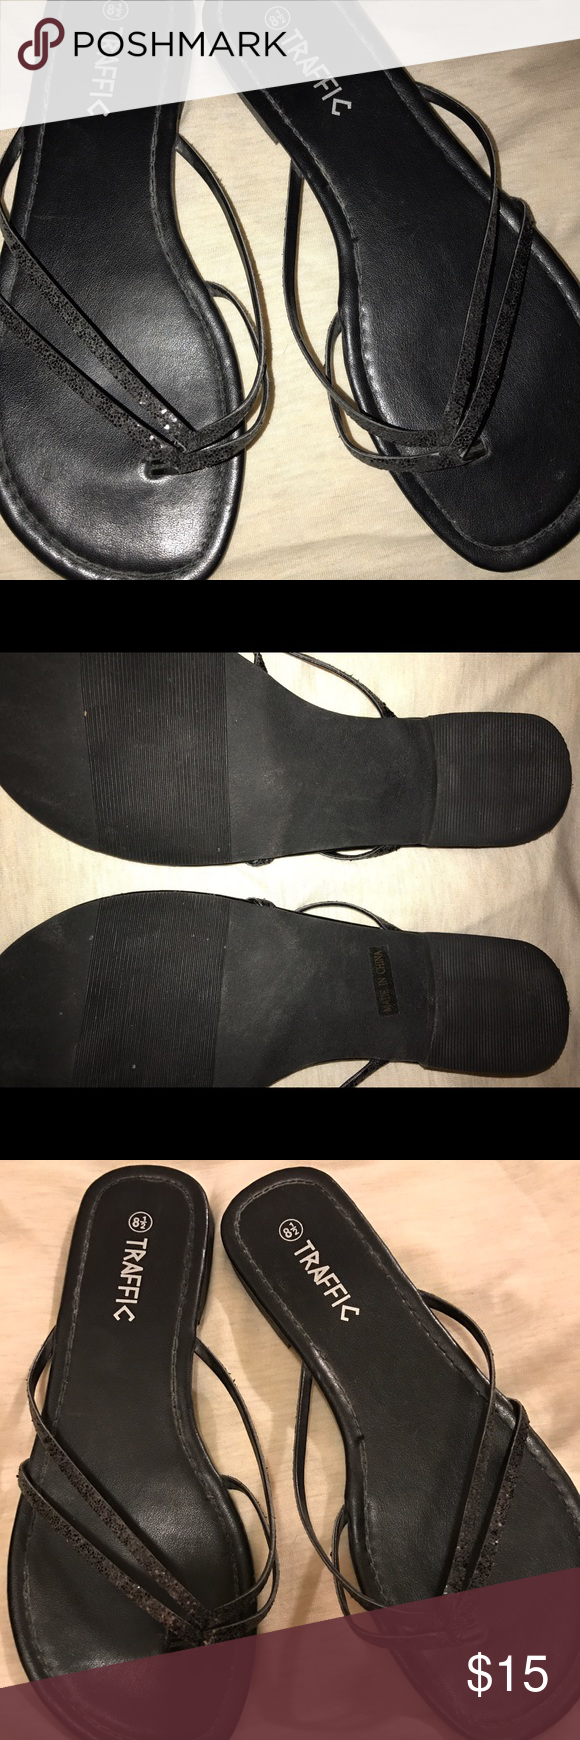 Black sparkle traffic sandals Like new black sparkle sandals. Only wore once. Size 8 1/2 Shoes Sandals